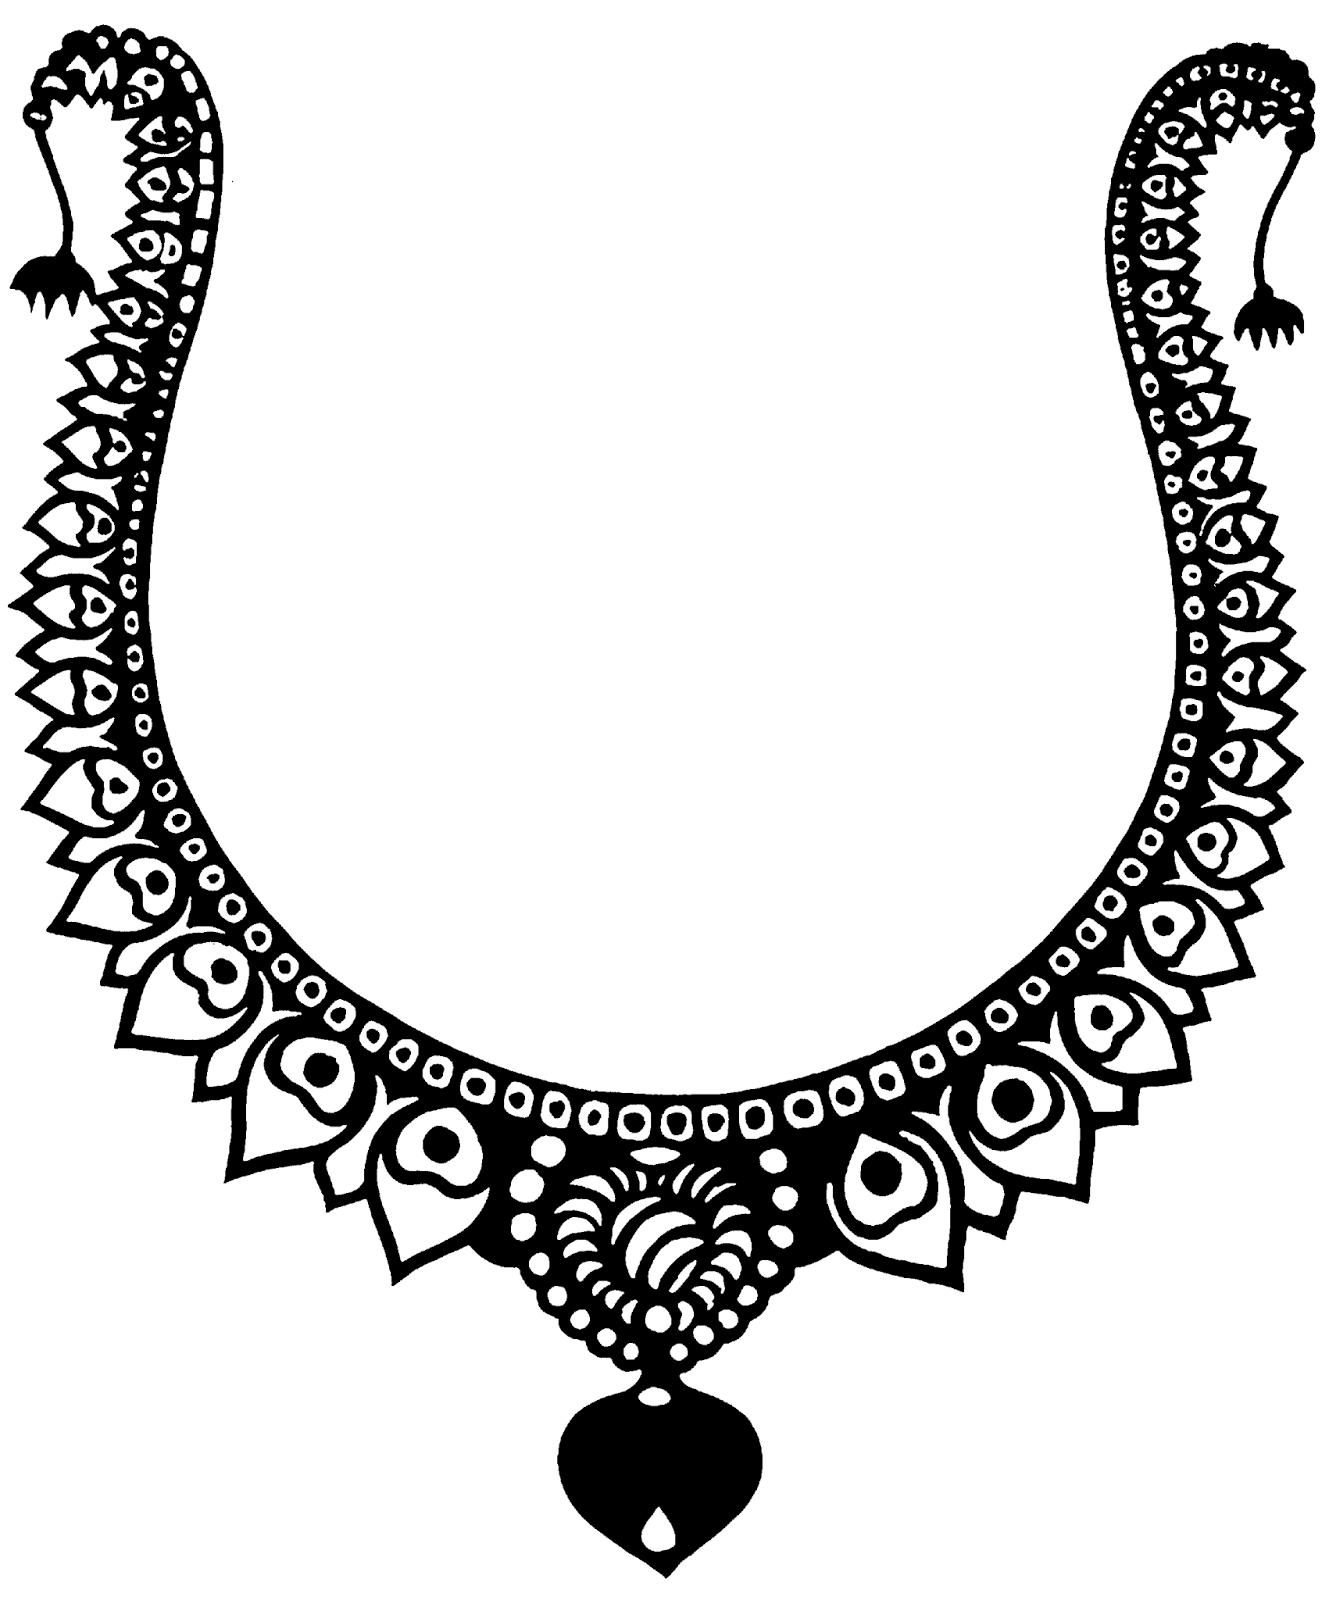 Ornaments clipart jewllery. Free jewelry cliparts white